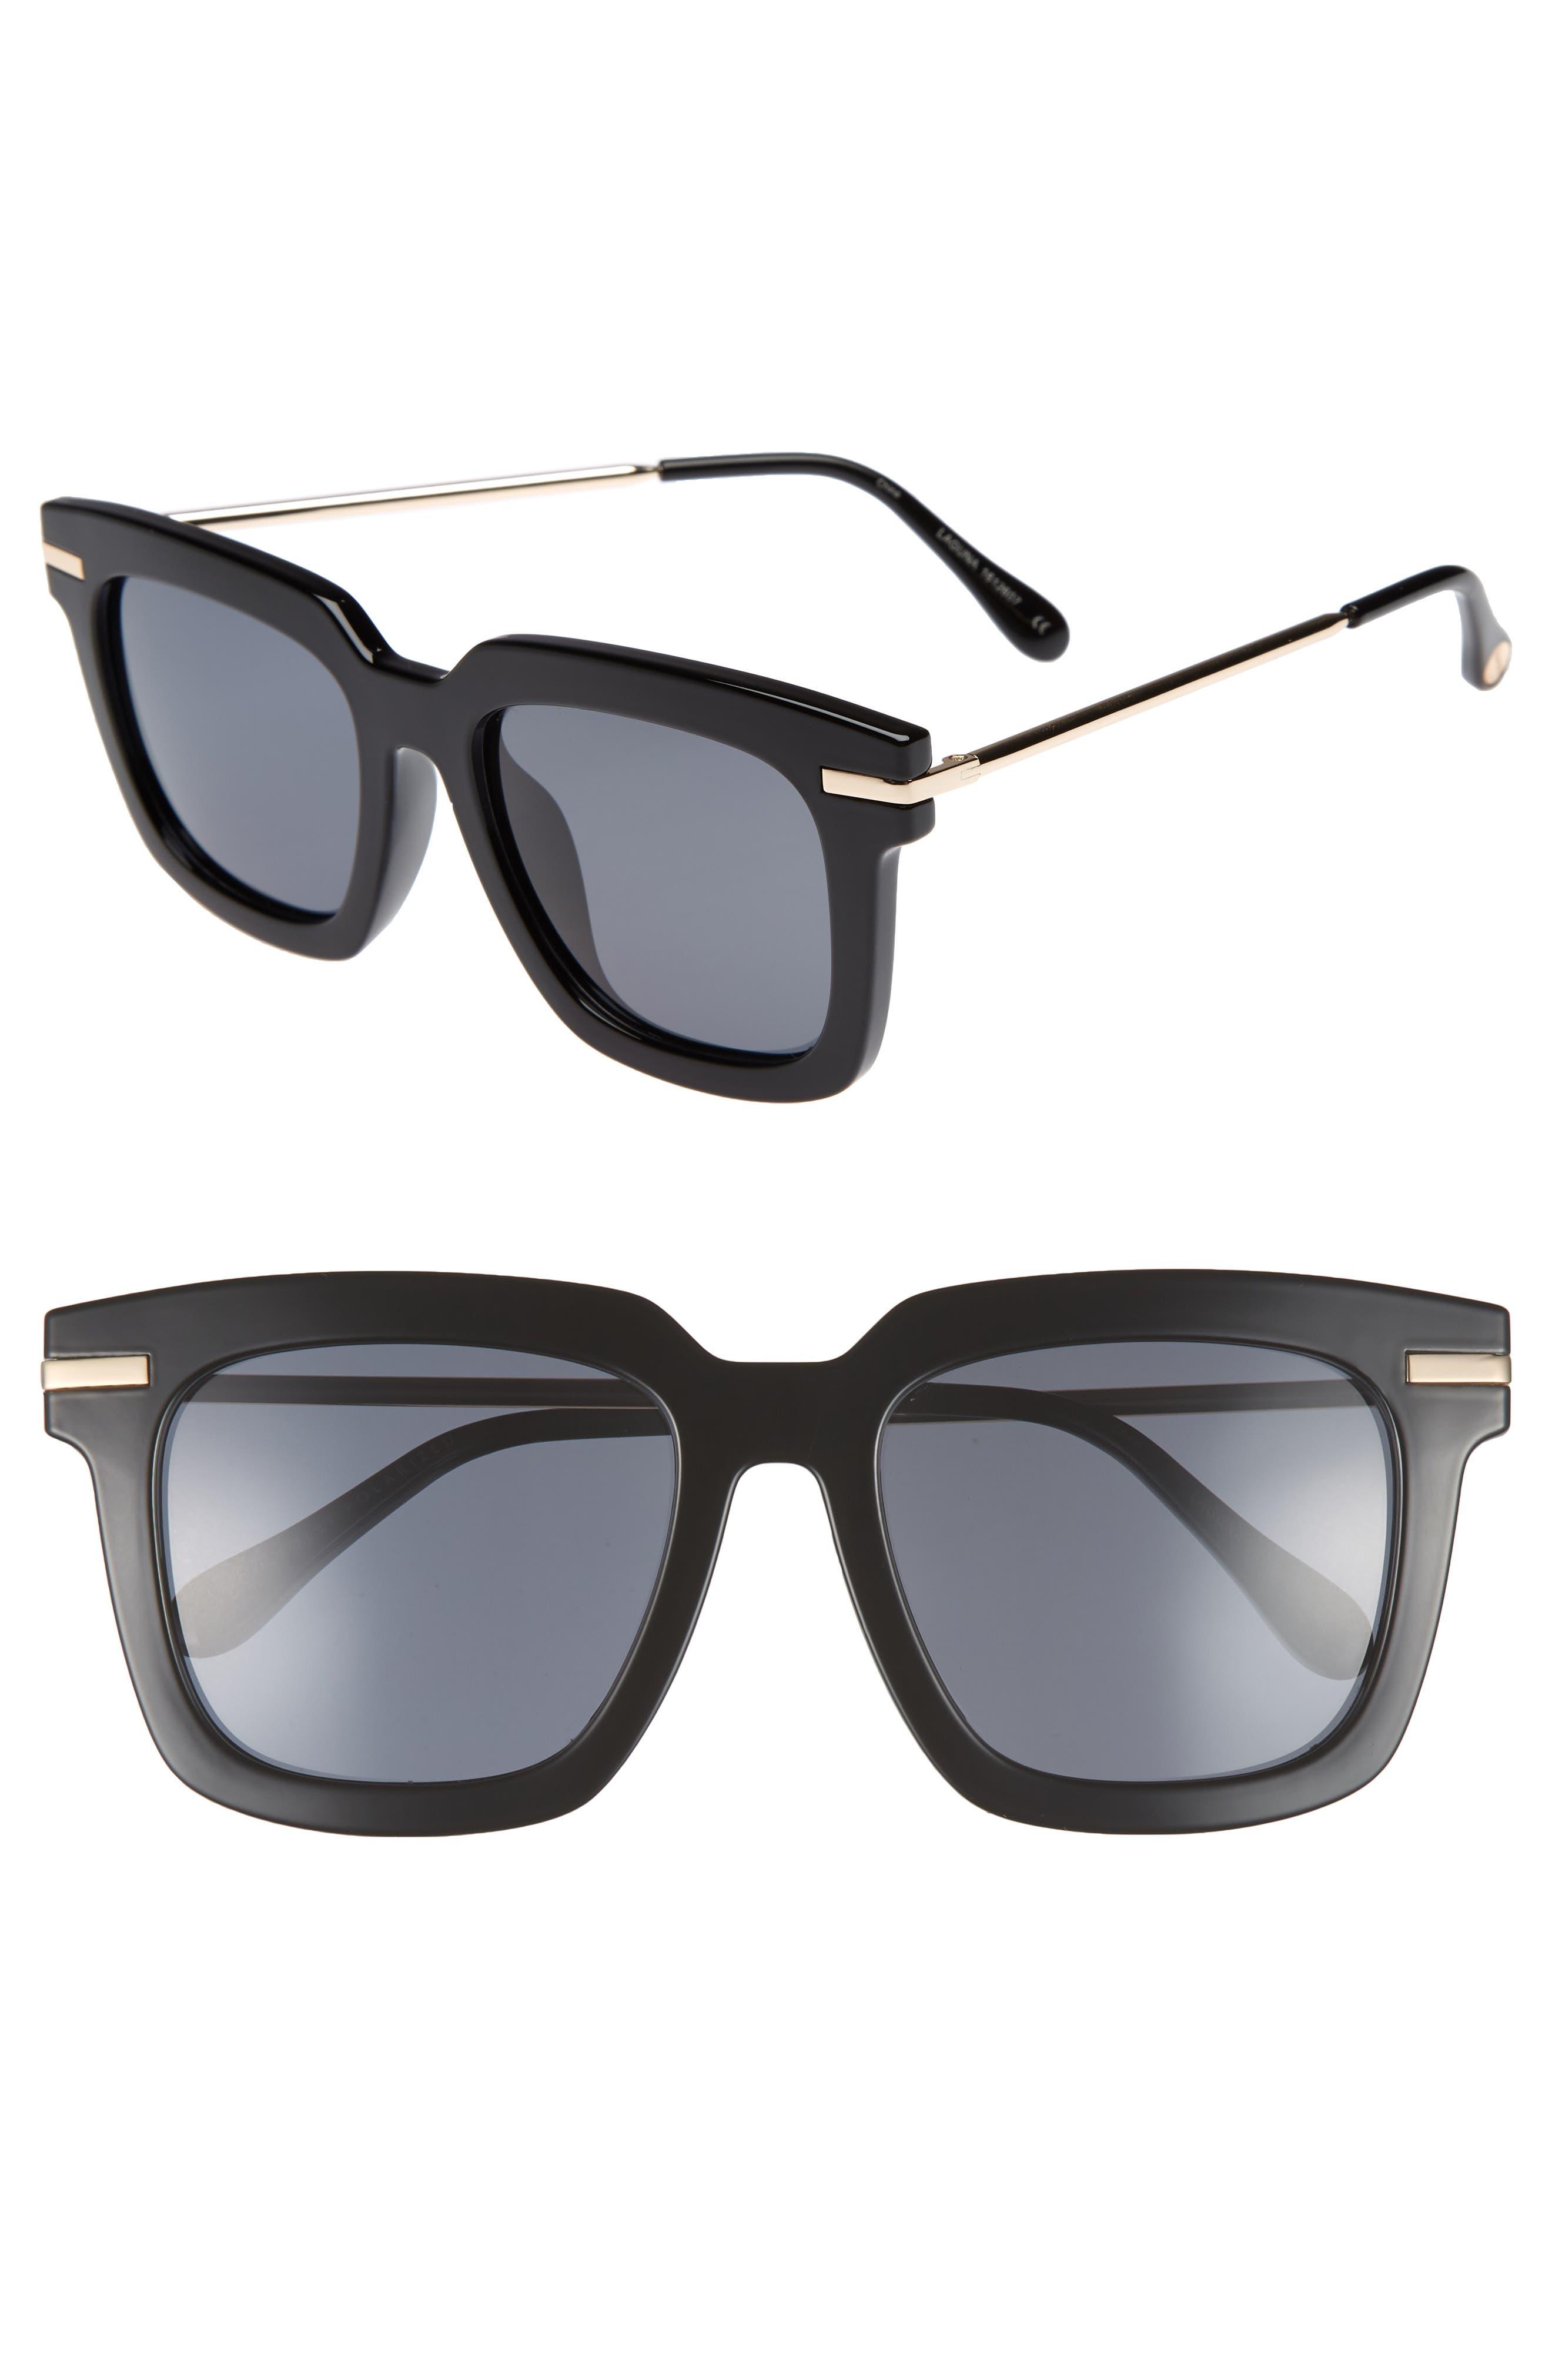 Laguna 51mm Polarized Sunglasses,                             Main thumbnail 1, color,                             Black